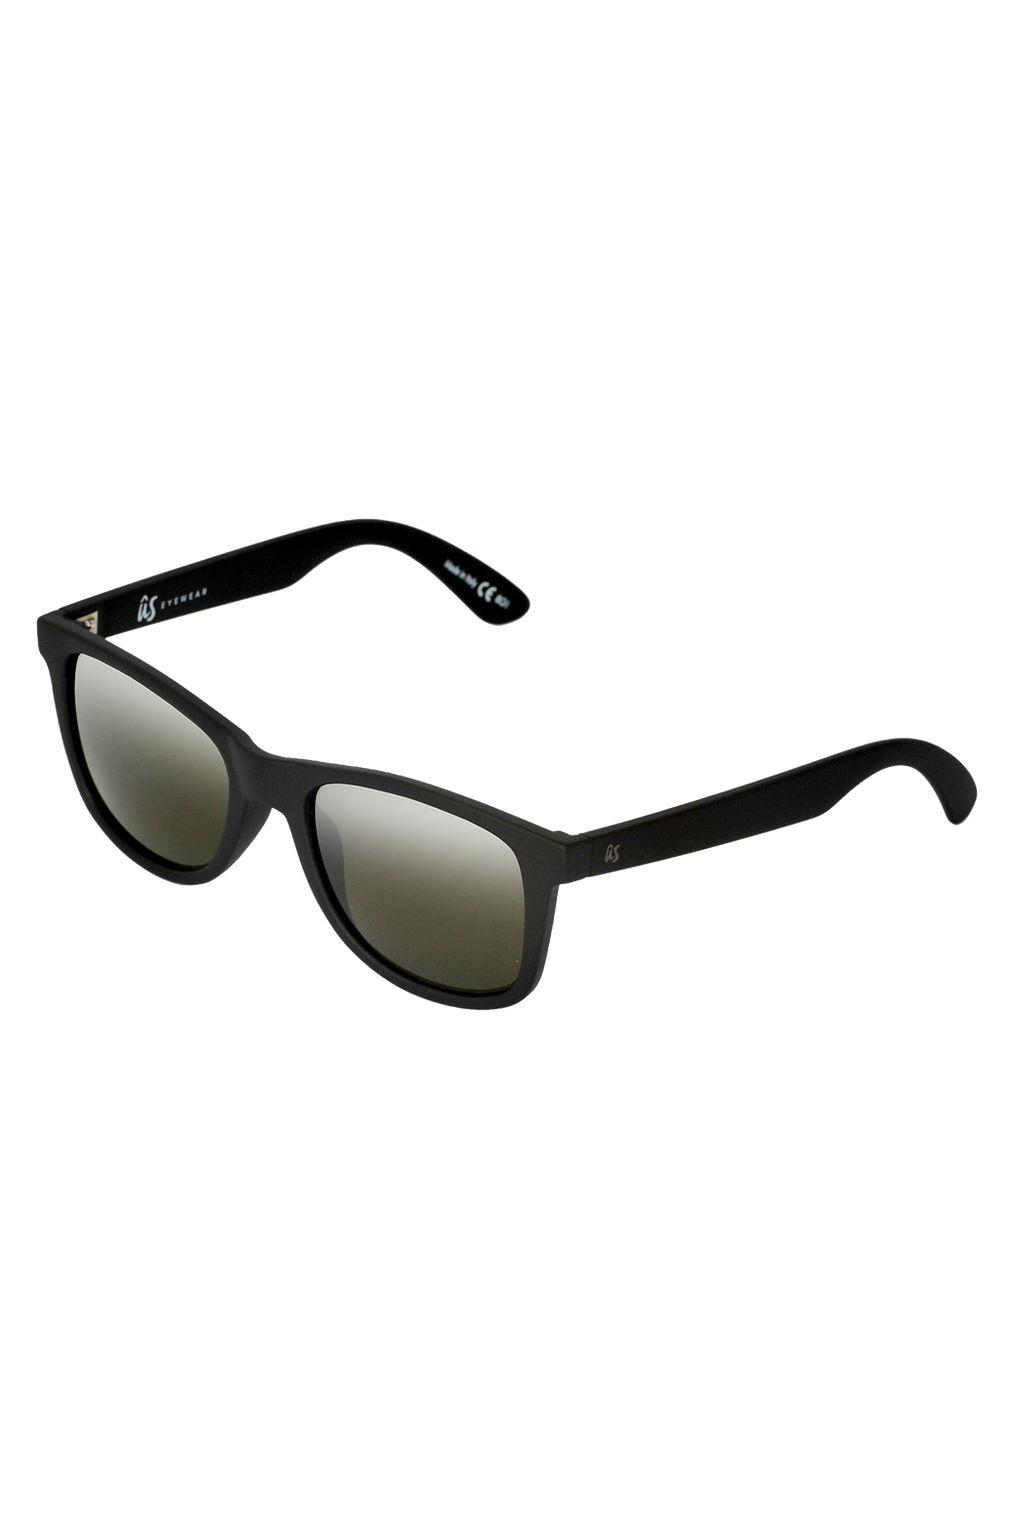 US Sunglasses MATY Matte Black/Vintage Grey Polarized